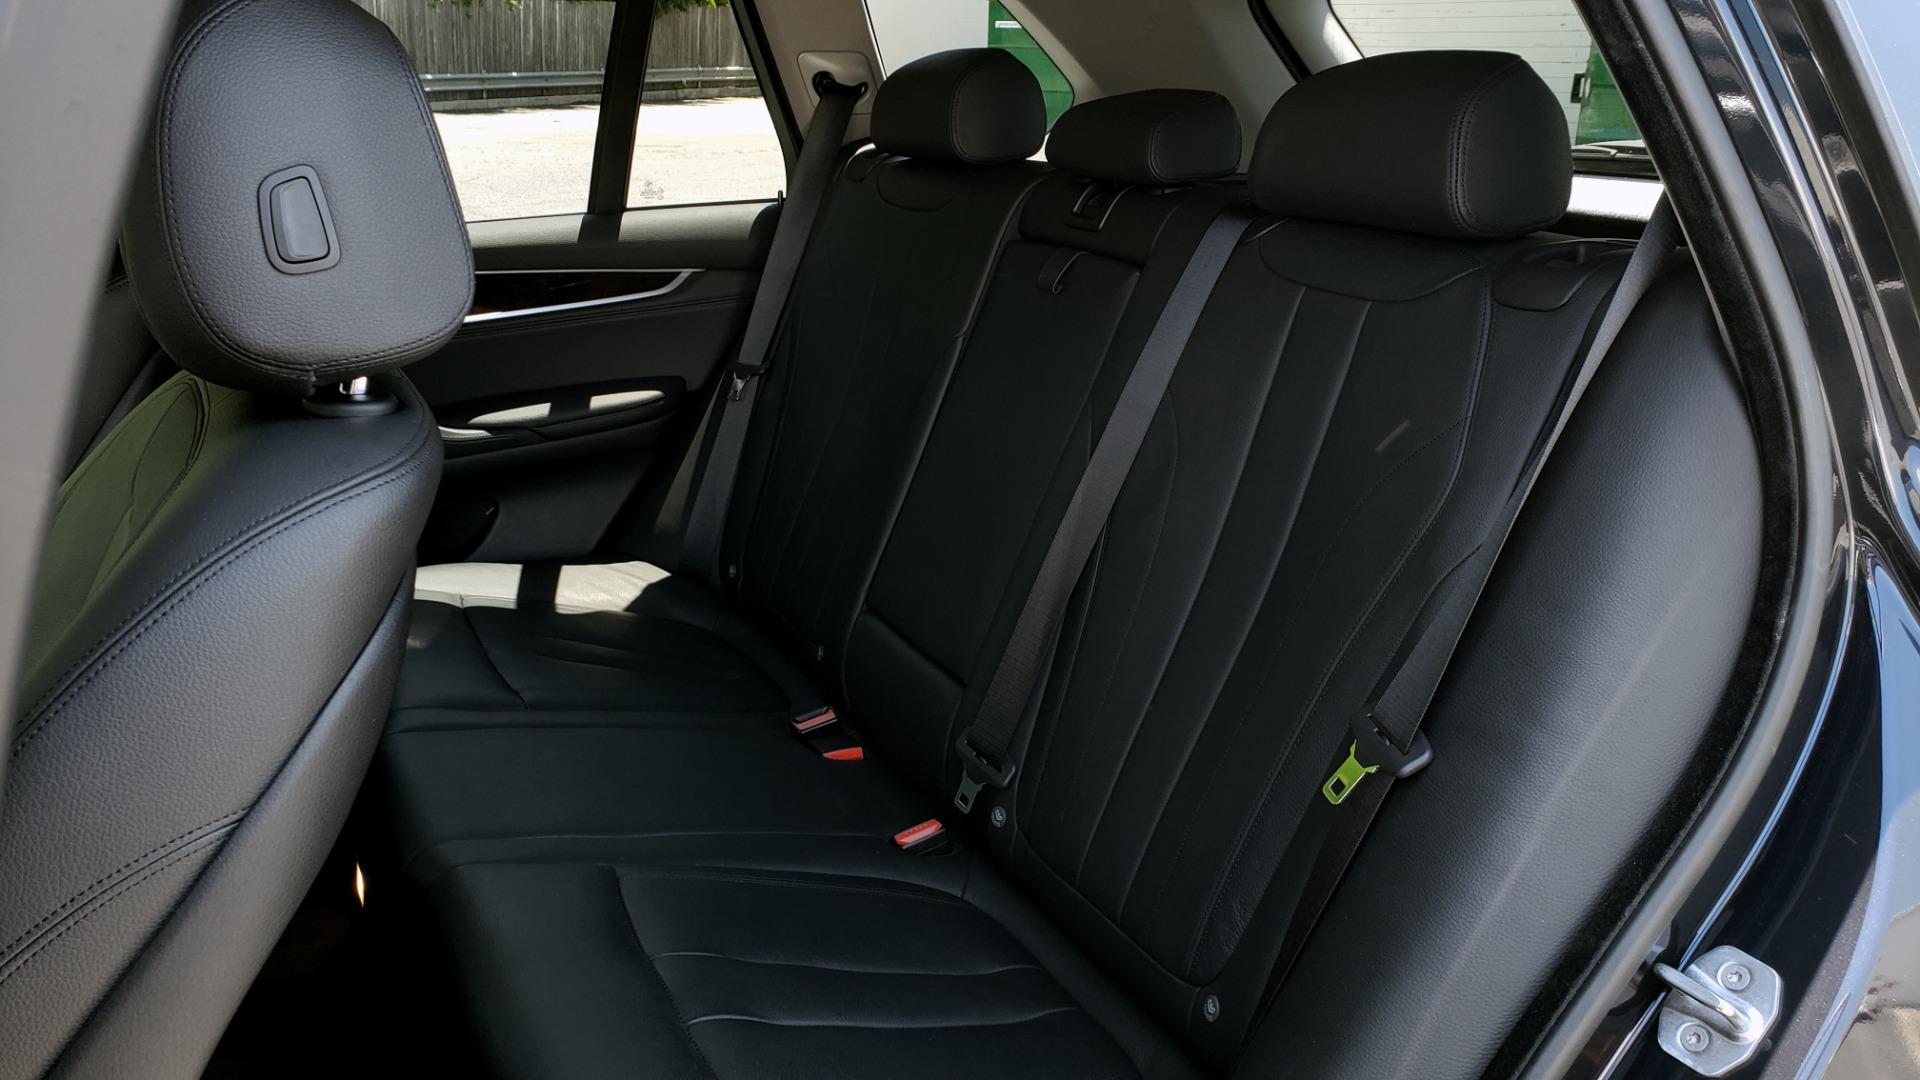 Used 2016 BMW X5 XDRIVE35I / PREM PKG / NAV / DRVR ASST PLUS / REARVIEW for sale $25,765 at Formula Imports in Charlotte NC 28227 61